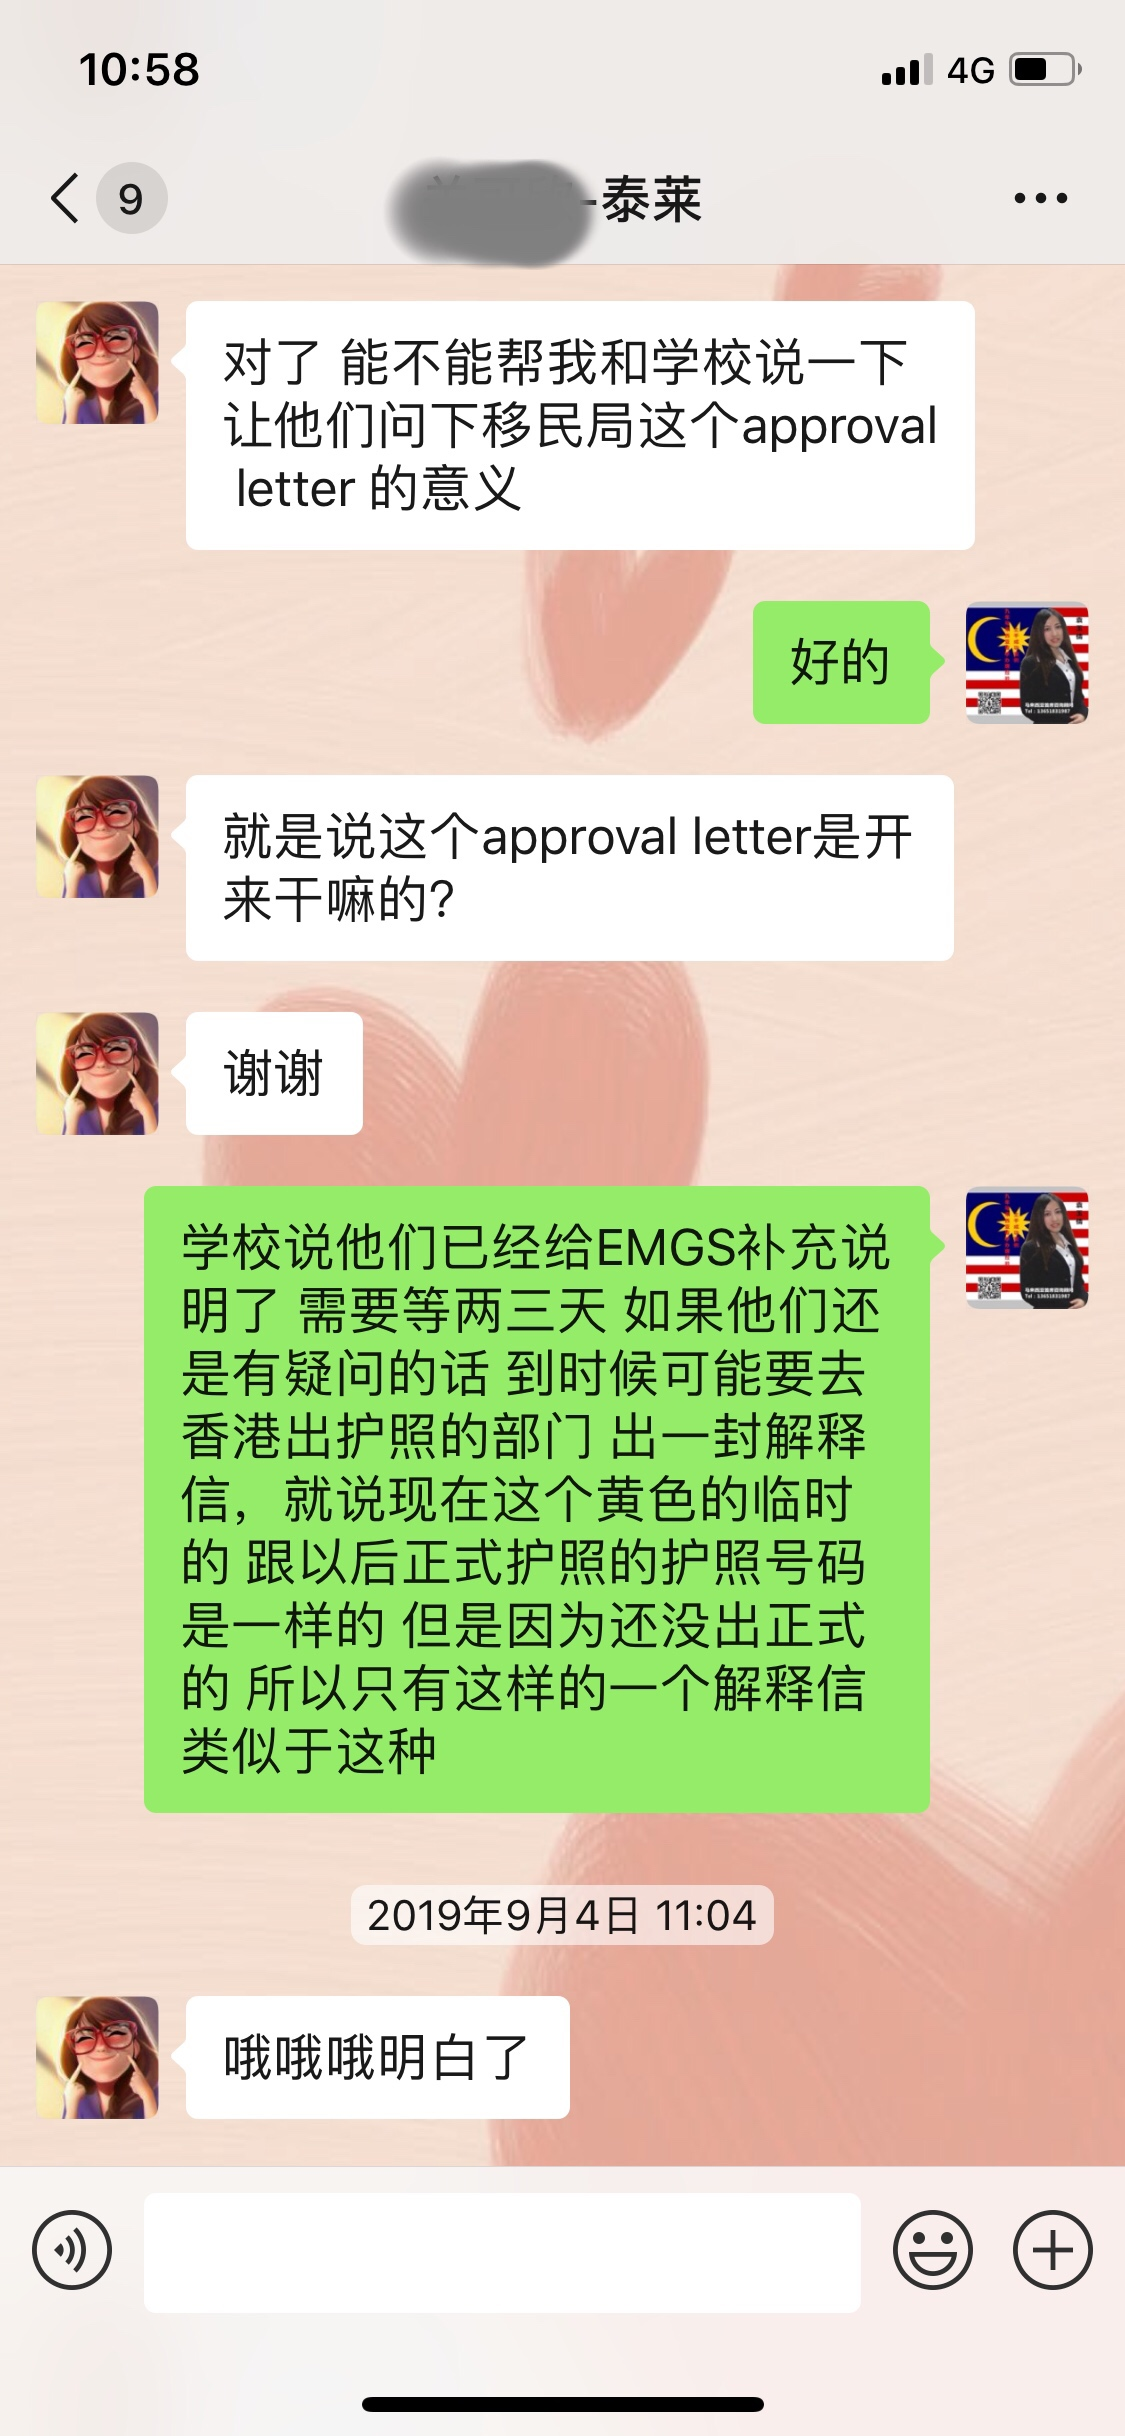 DIY风险多多,袁老师拯救J同学圆梦泰莱大学!